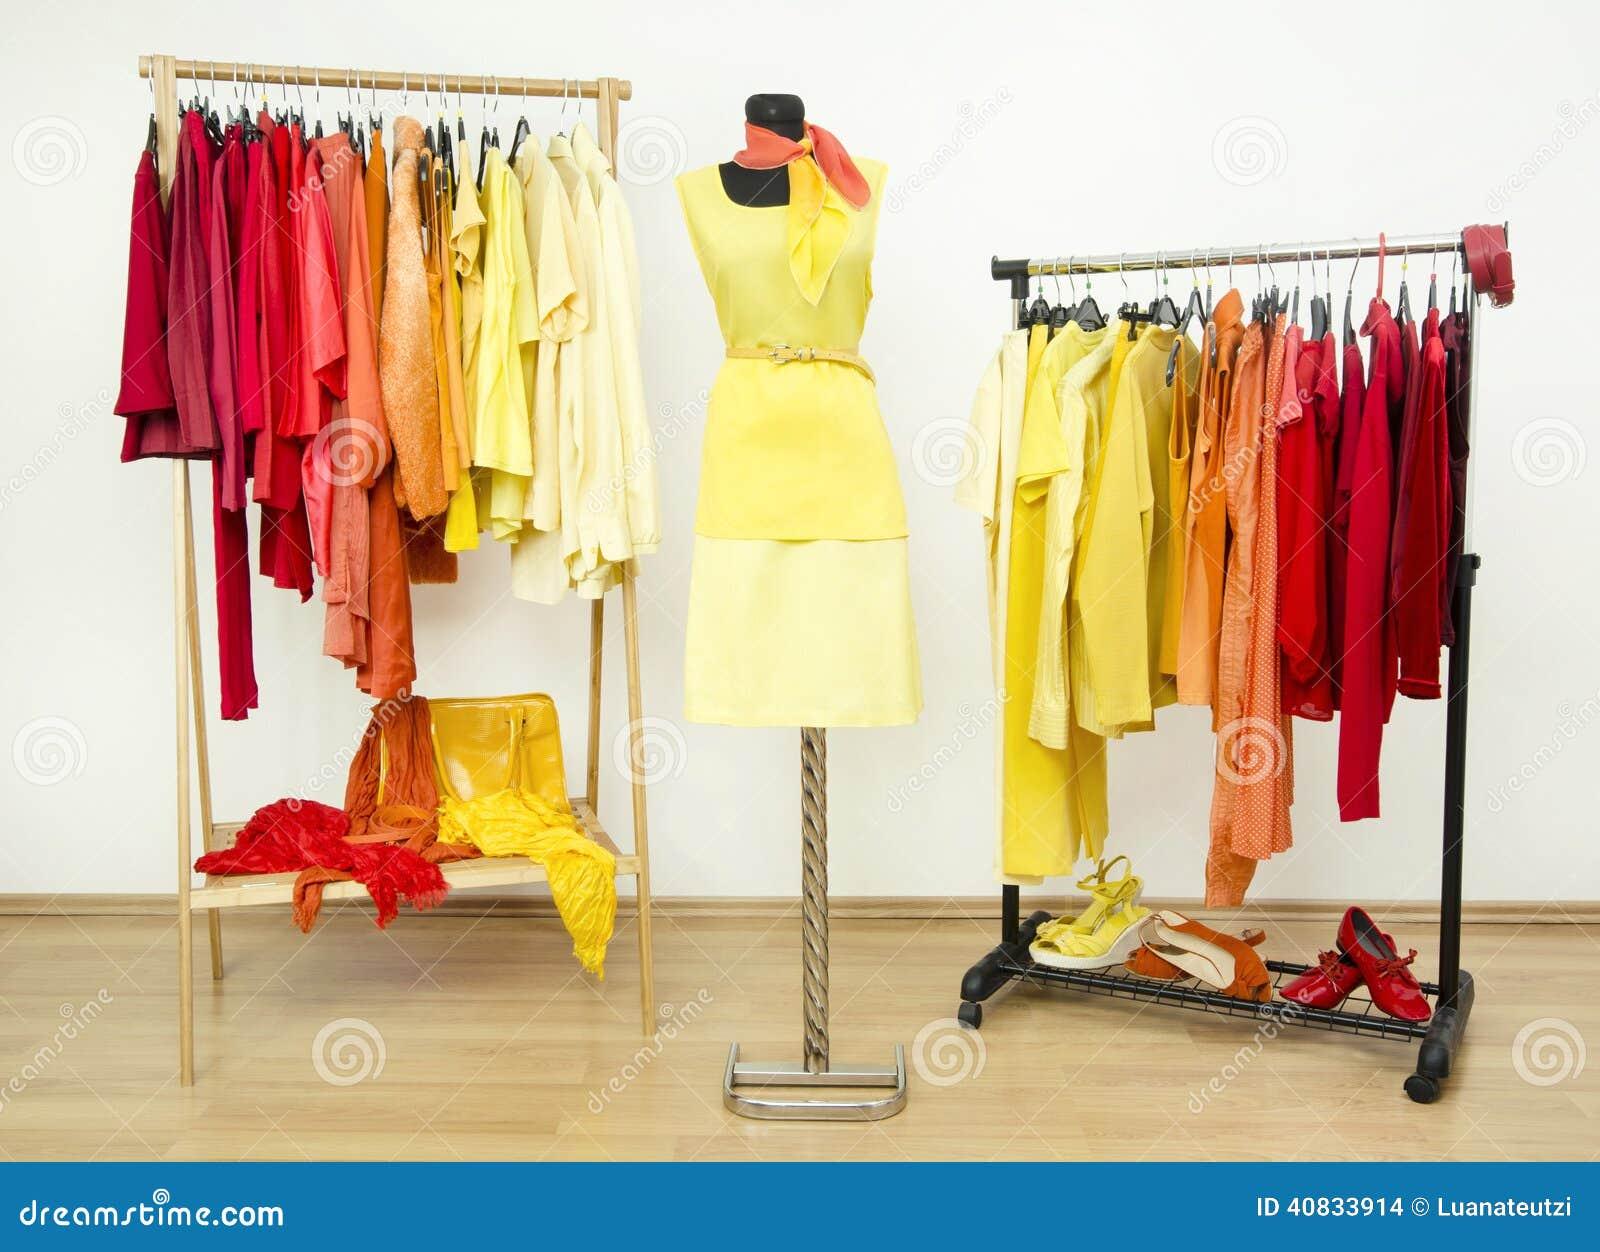 Business in fashion merchandising 47